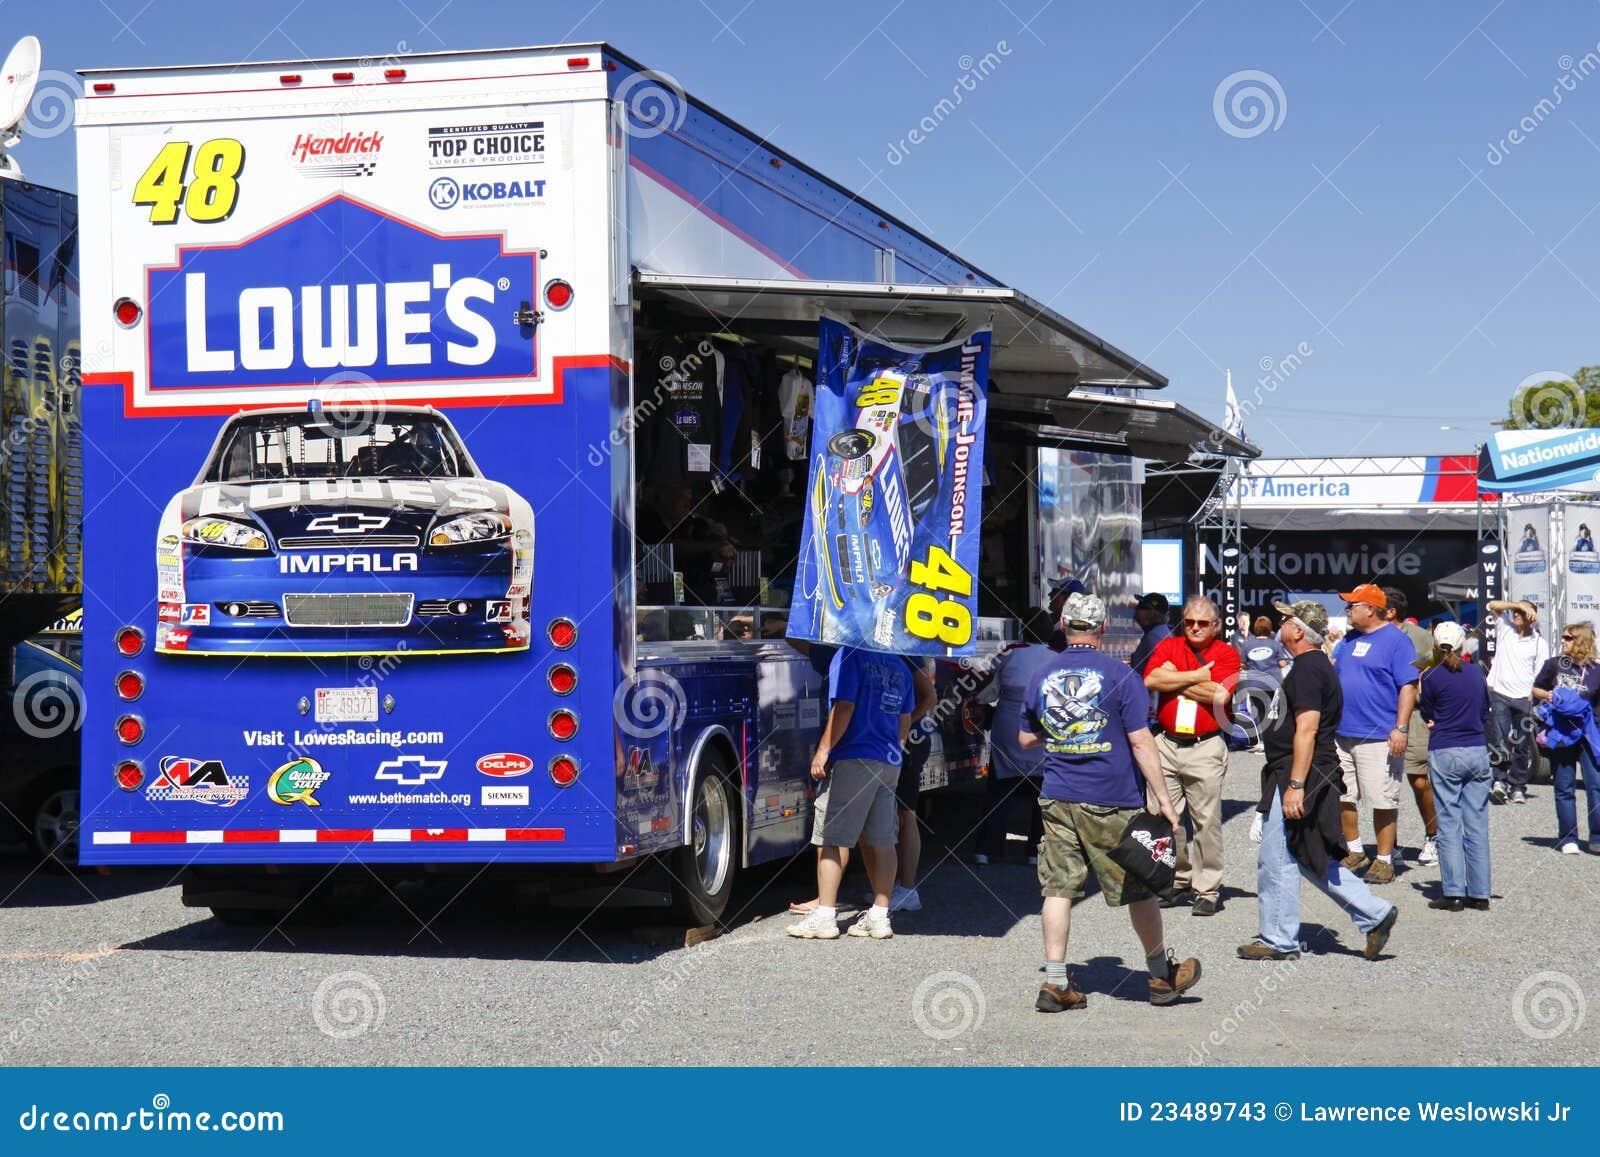 NASCAR - Fans Shop At Johnson'sTrailer Editorial Stock ...